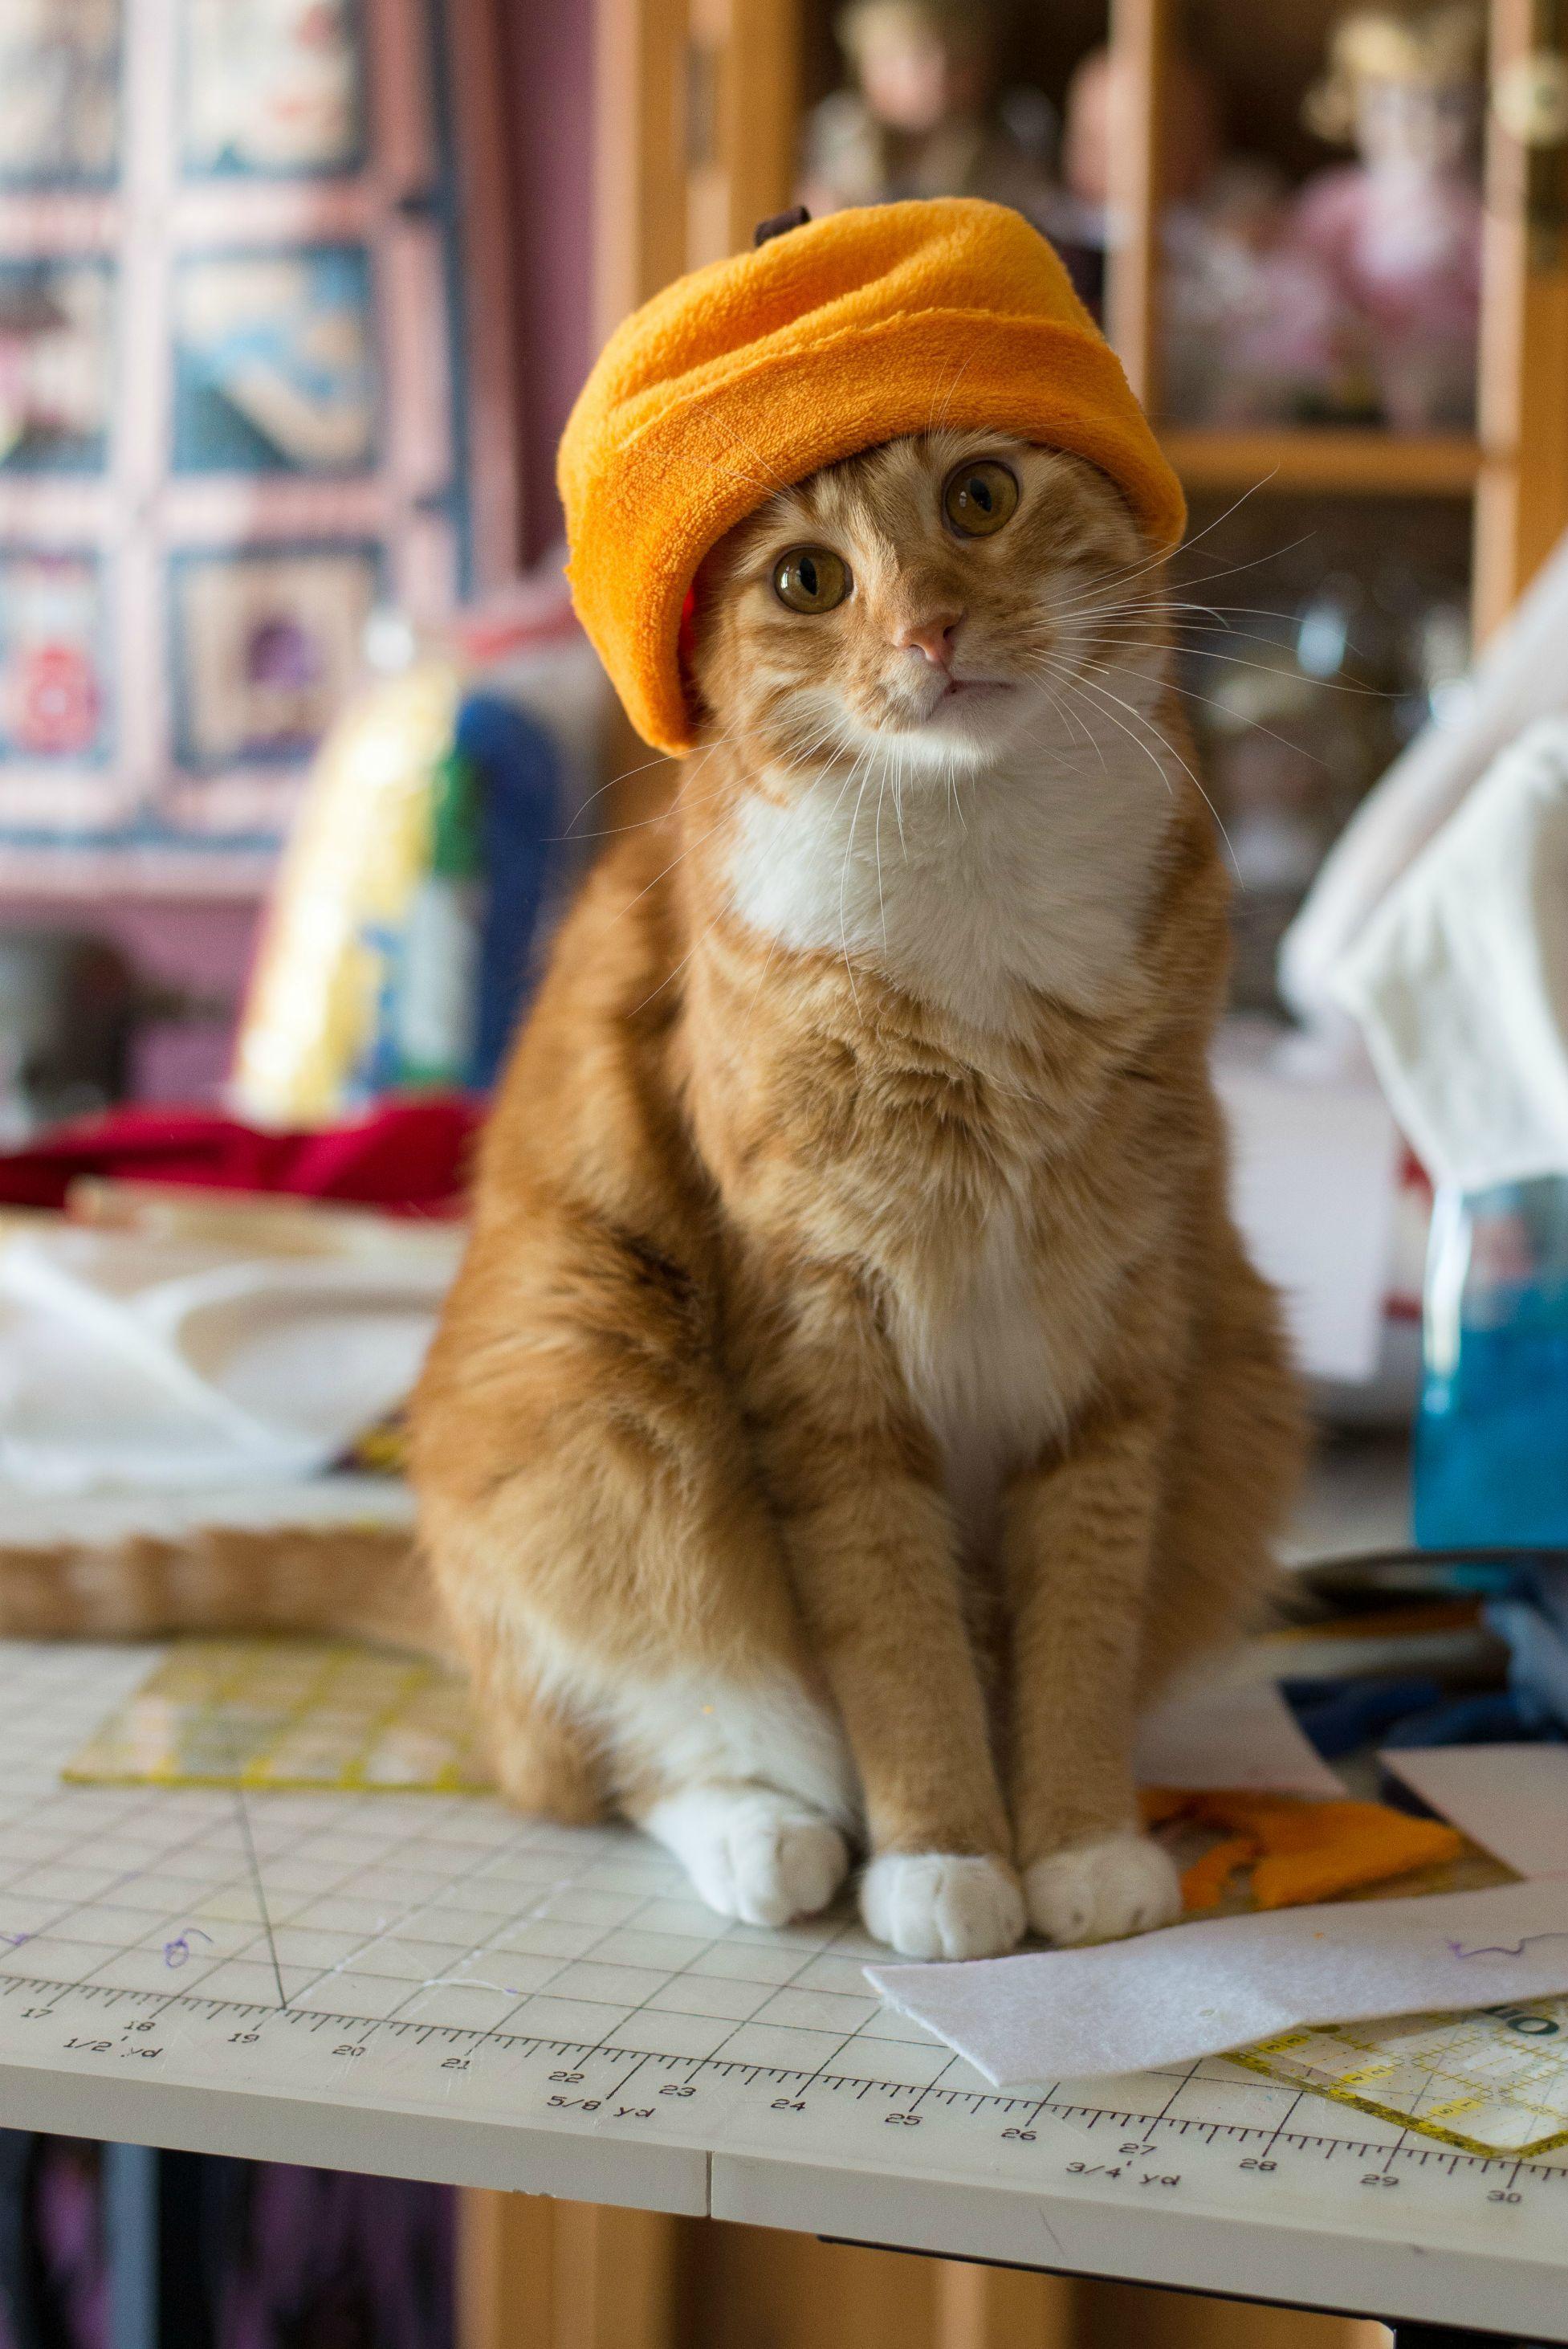 Hat Cats Cute Cats Cute Animals Pretty Cats